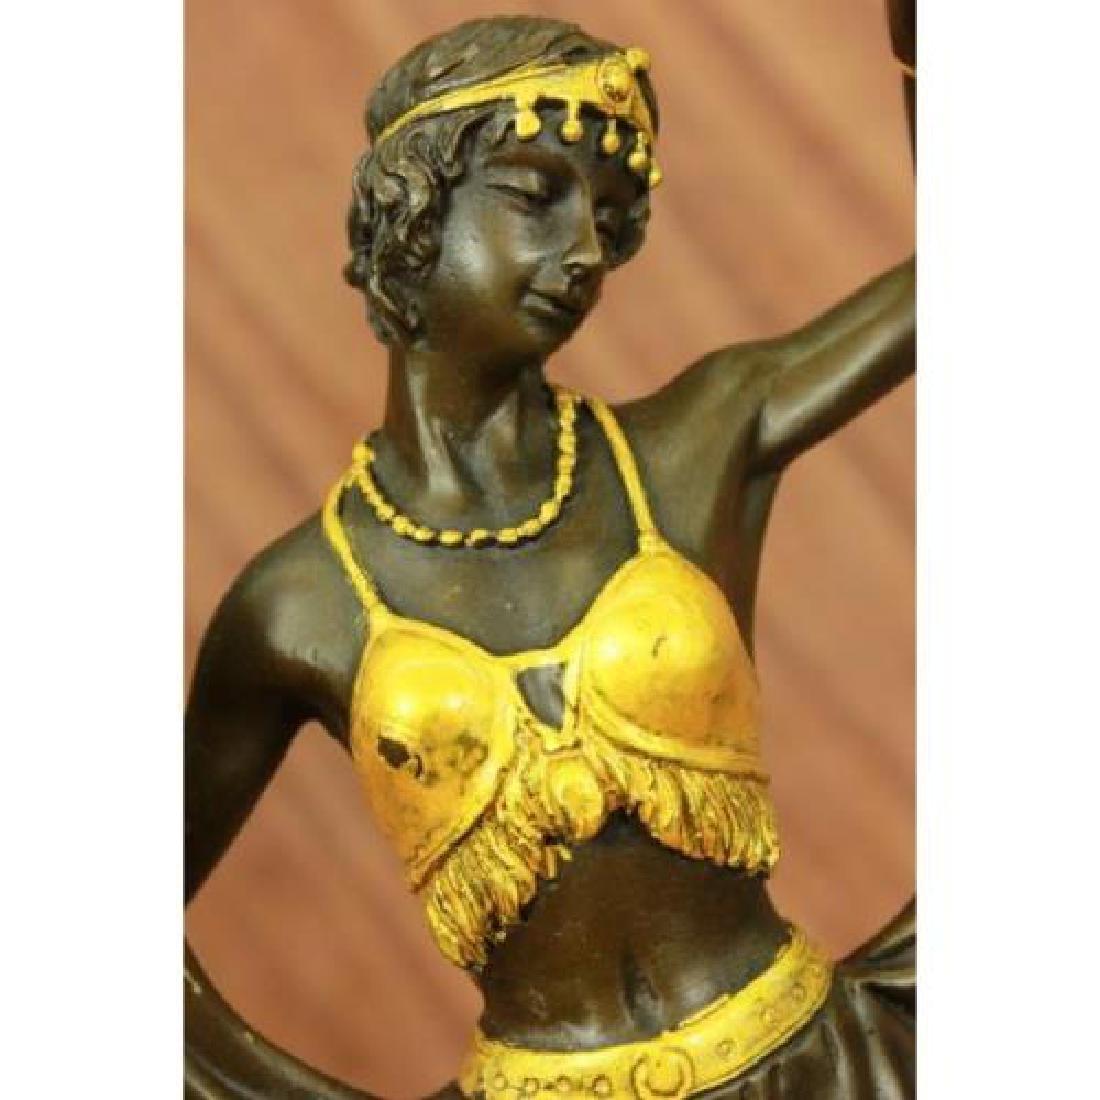 Arabian Girl With Lifting Skirt on Rug Bronze Sculpture - 2